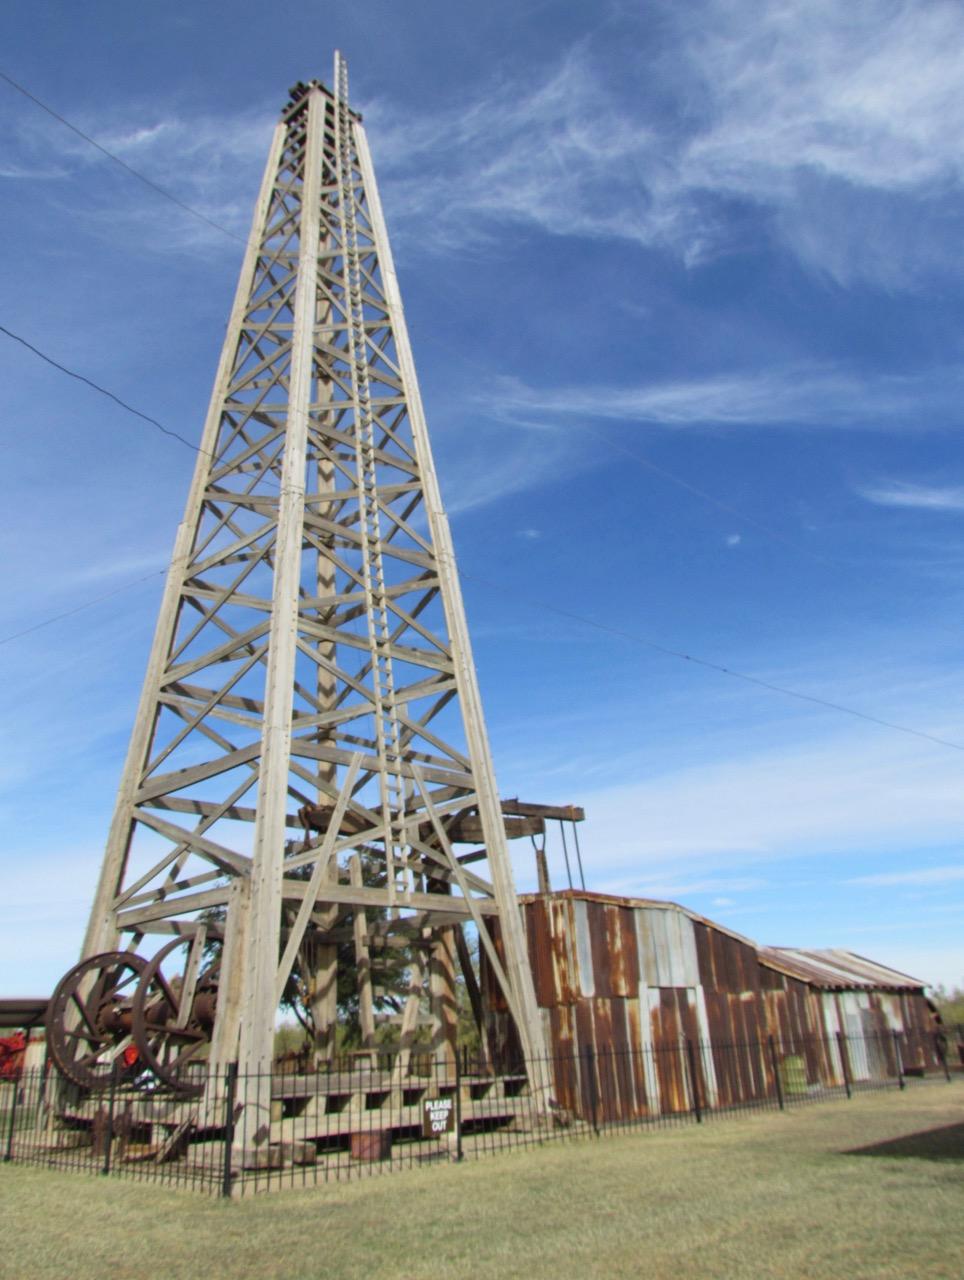 Santa Rita No. 2 rig has been restored at the museum